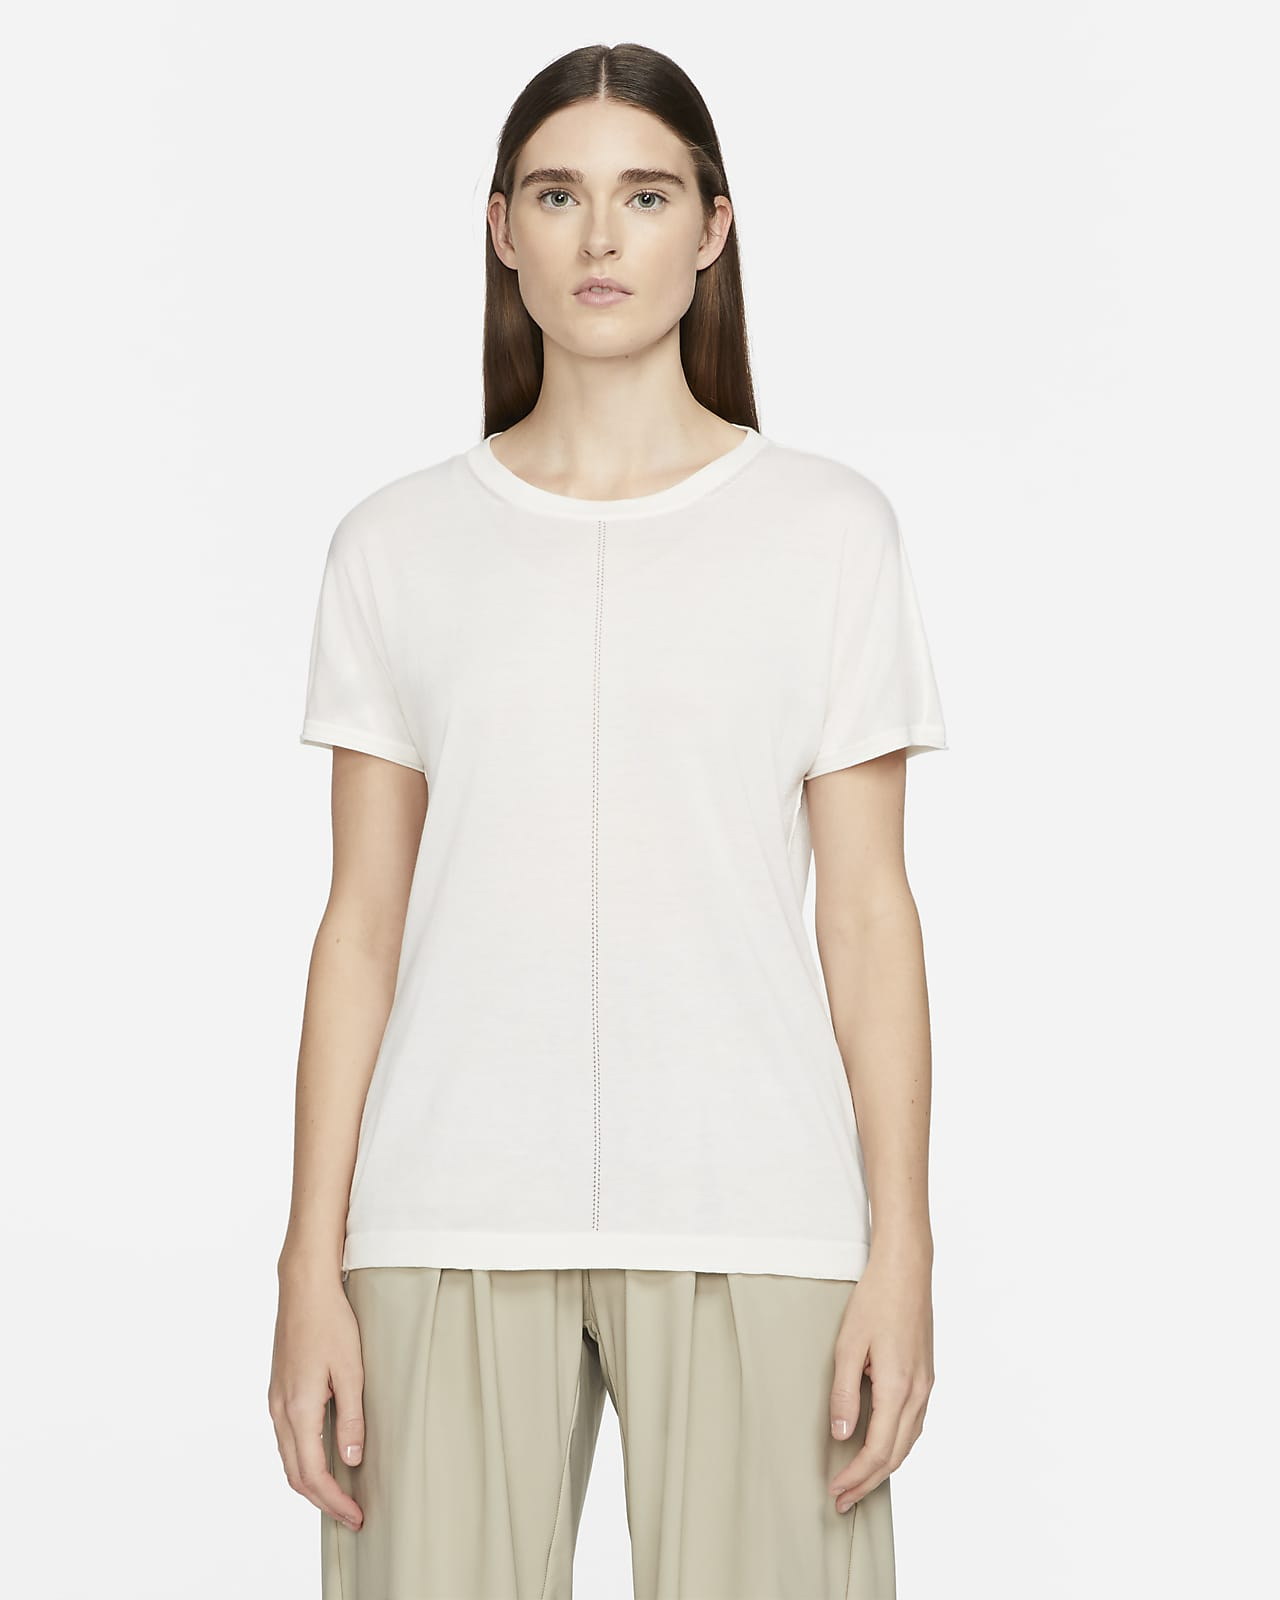 Nike ESC Women's Short-Sleeve Knit Top